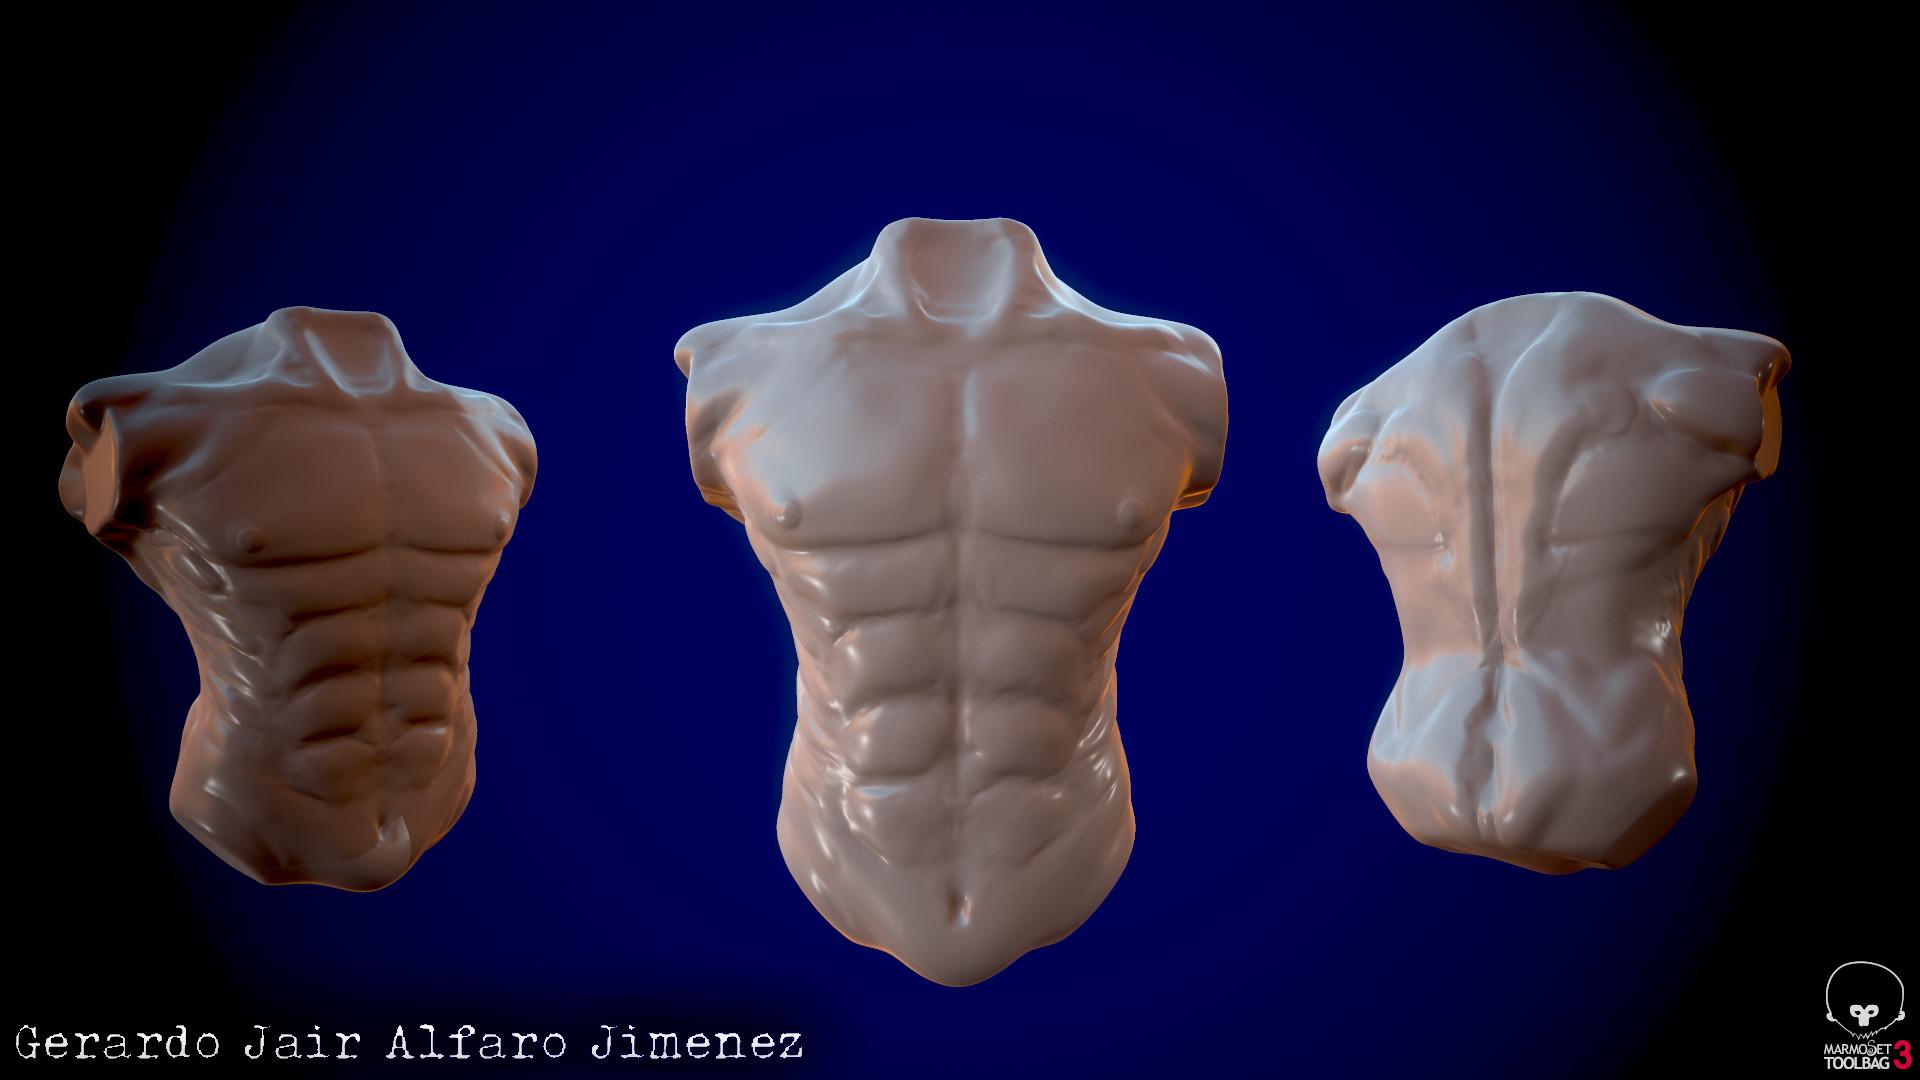 Gerardo Jair Alfaro Jimnez Anatomy Study Male Chest